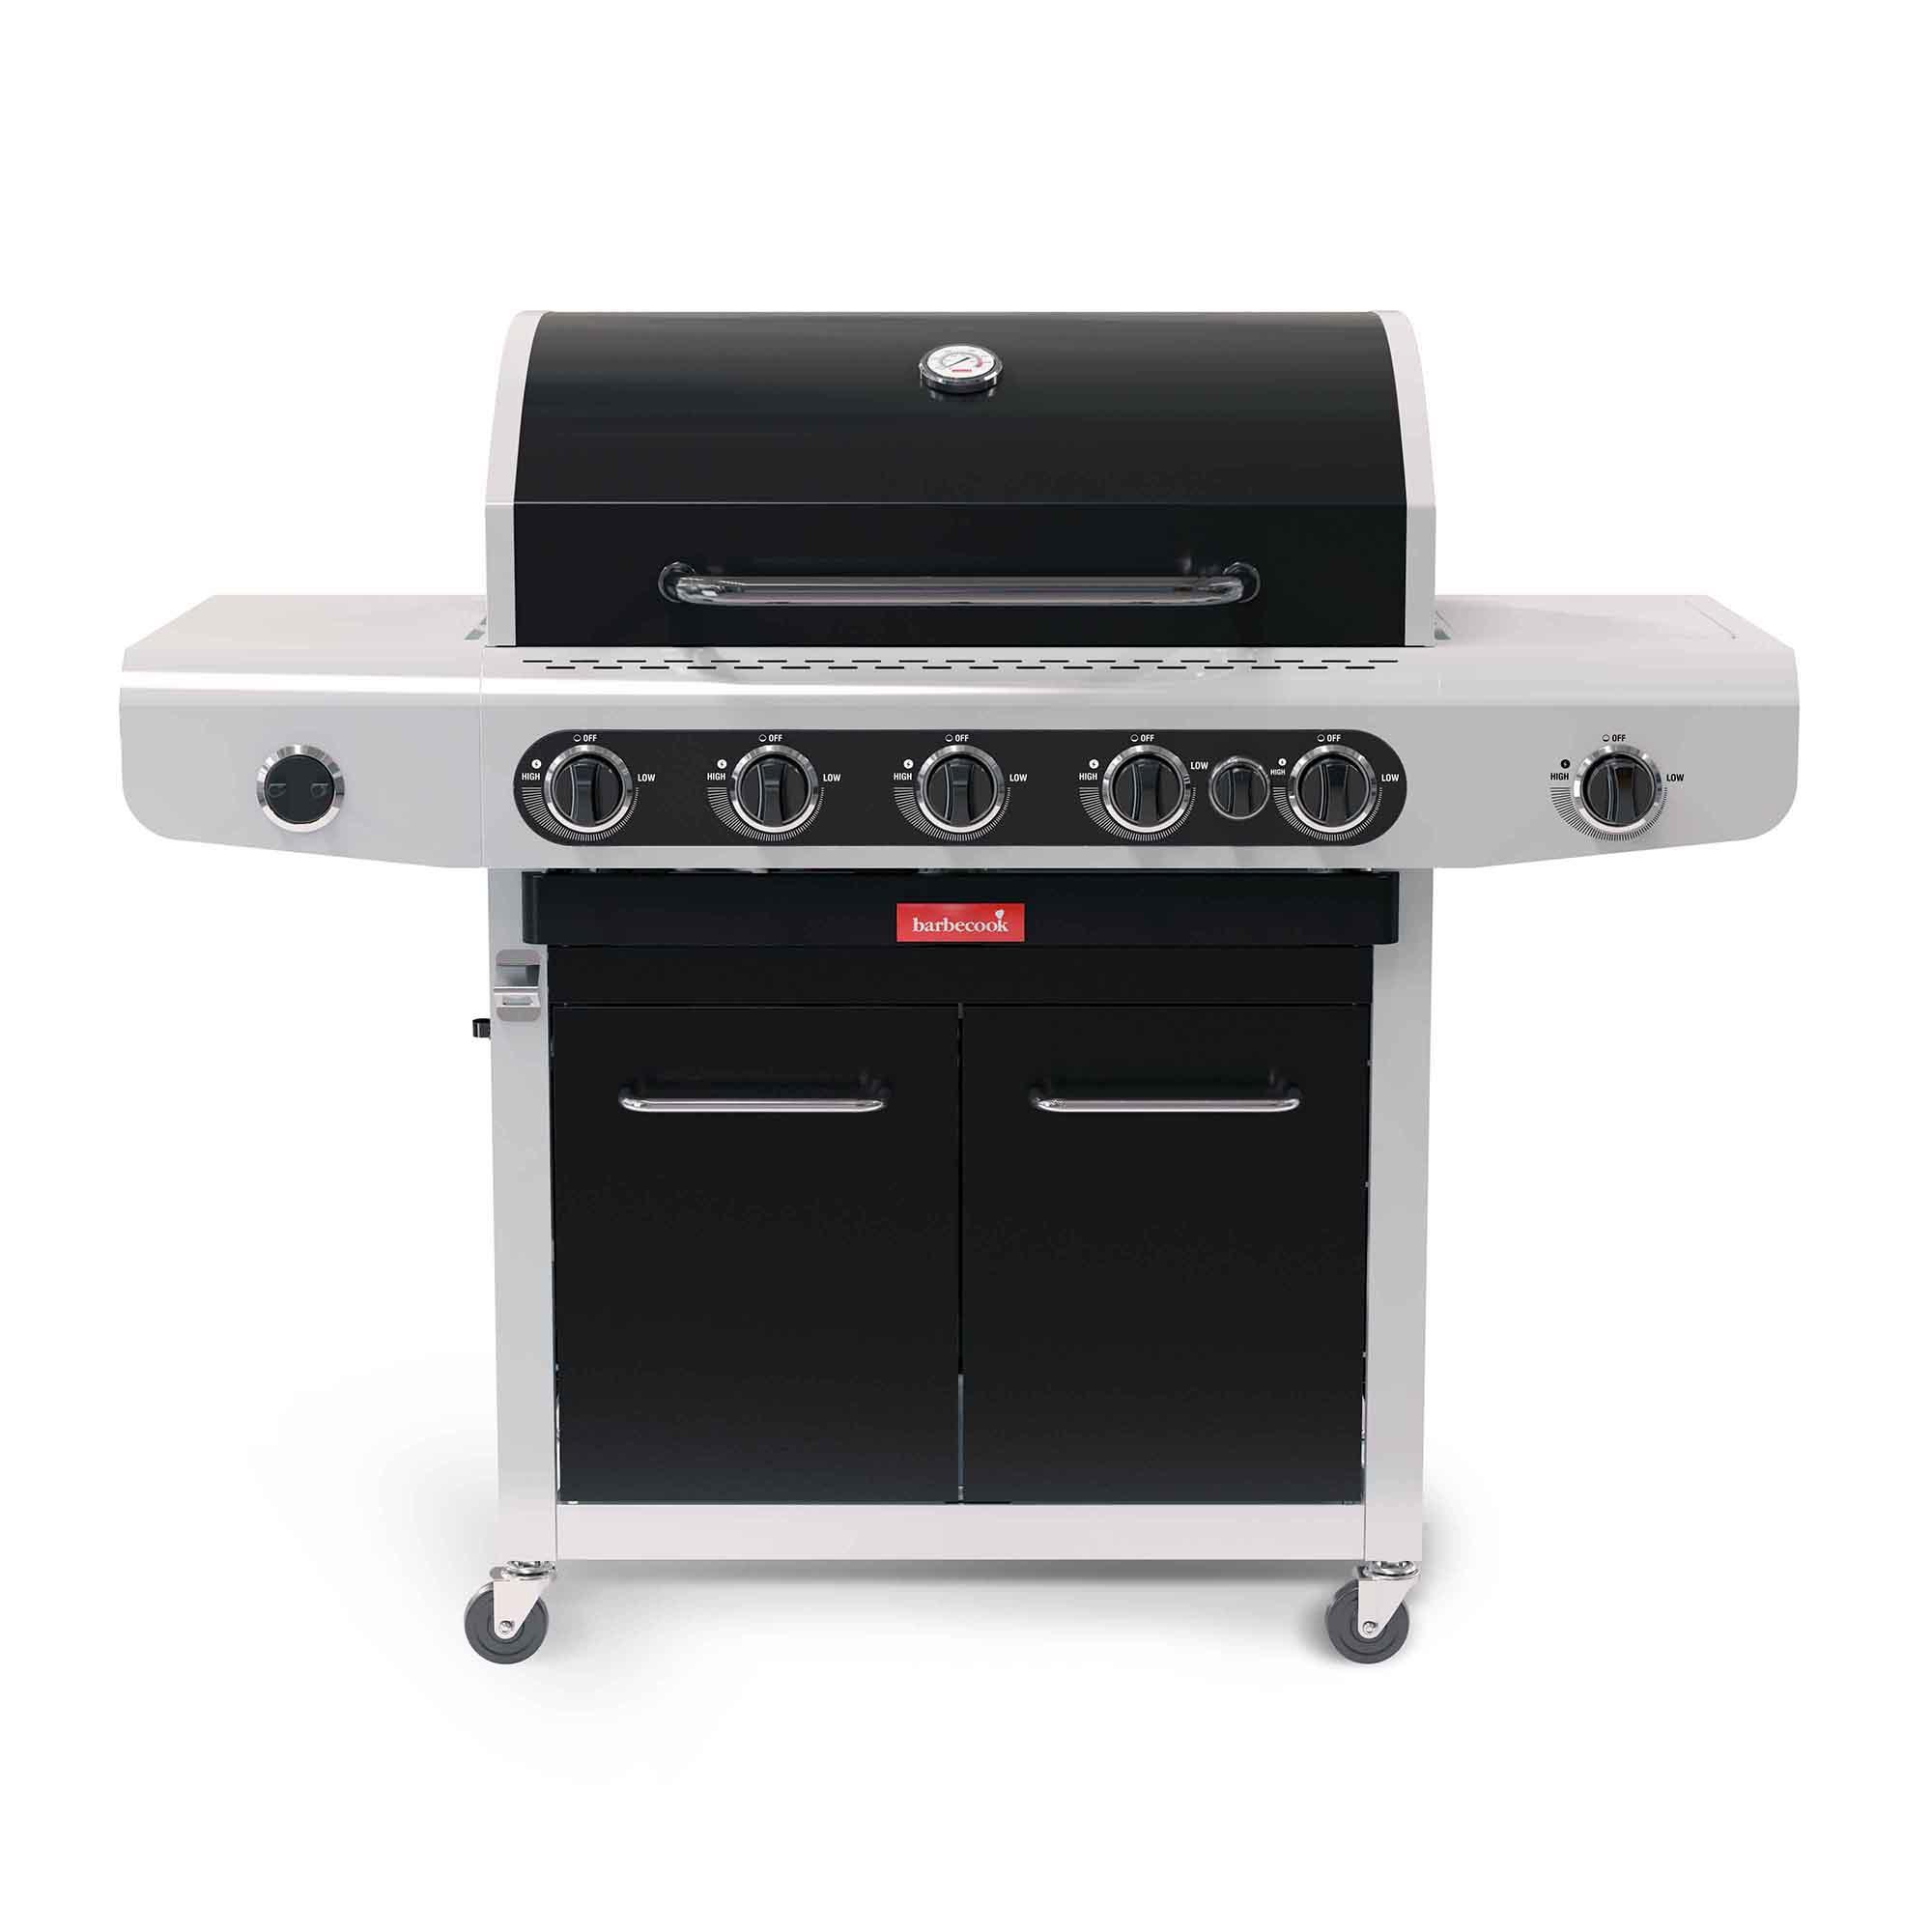 Barbecook Siesta 612 Black Edition gas barbecue 14